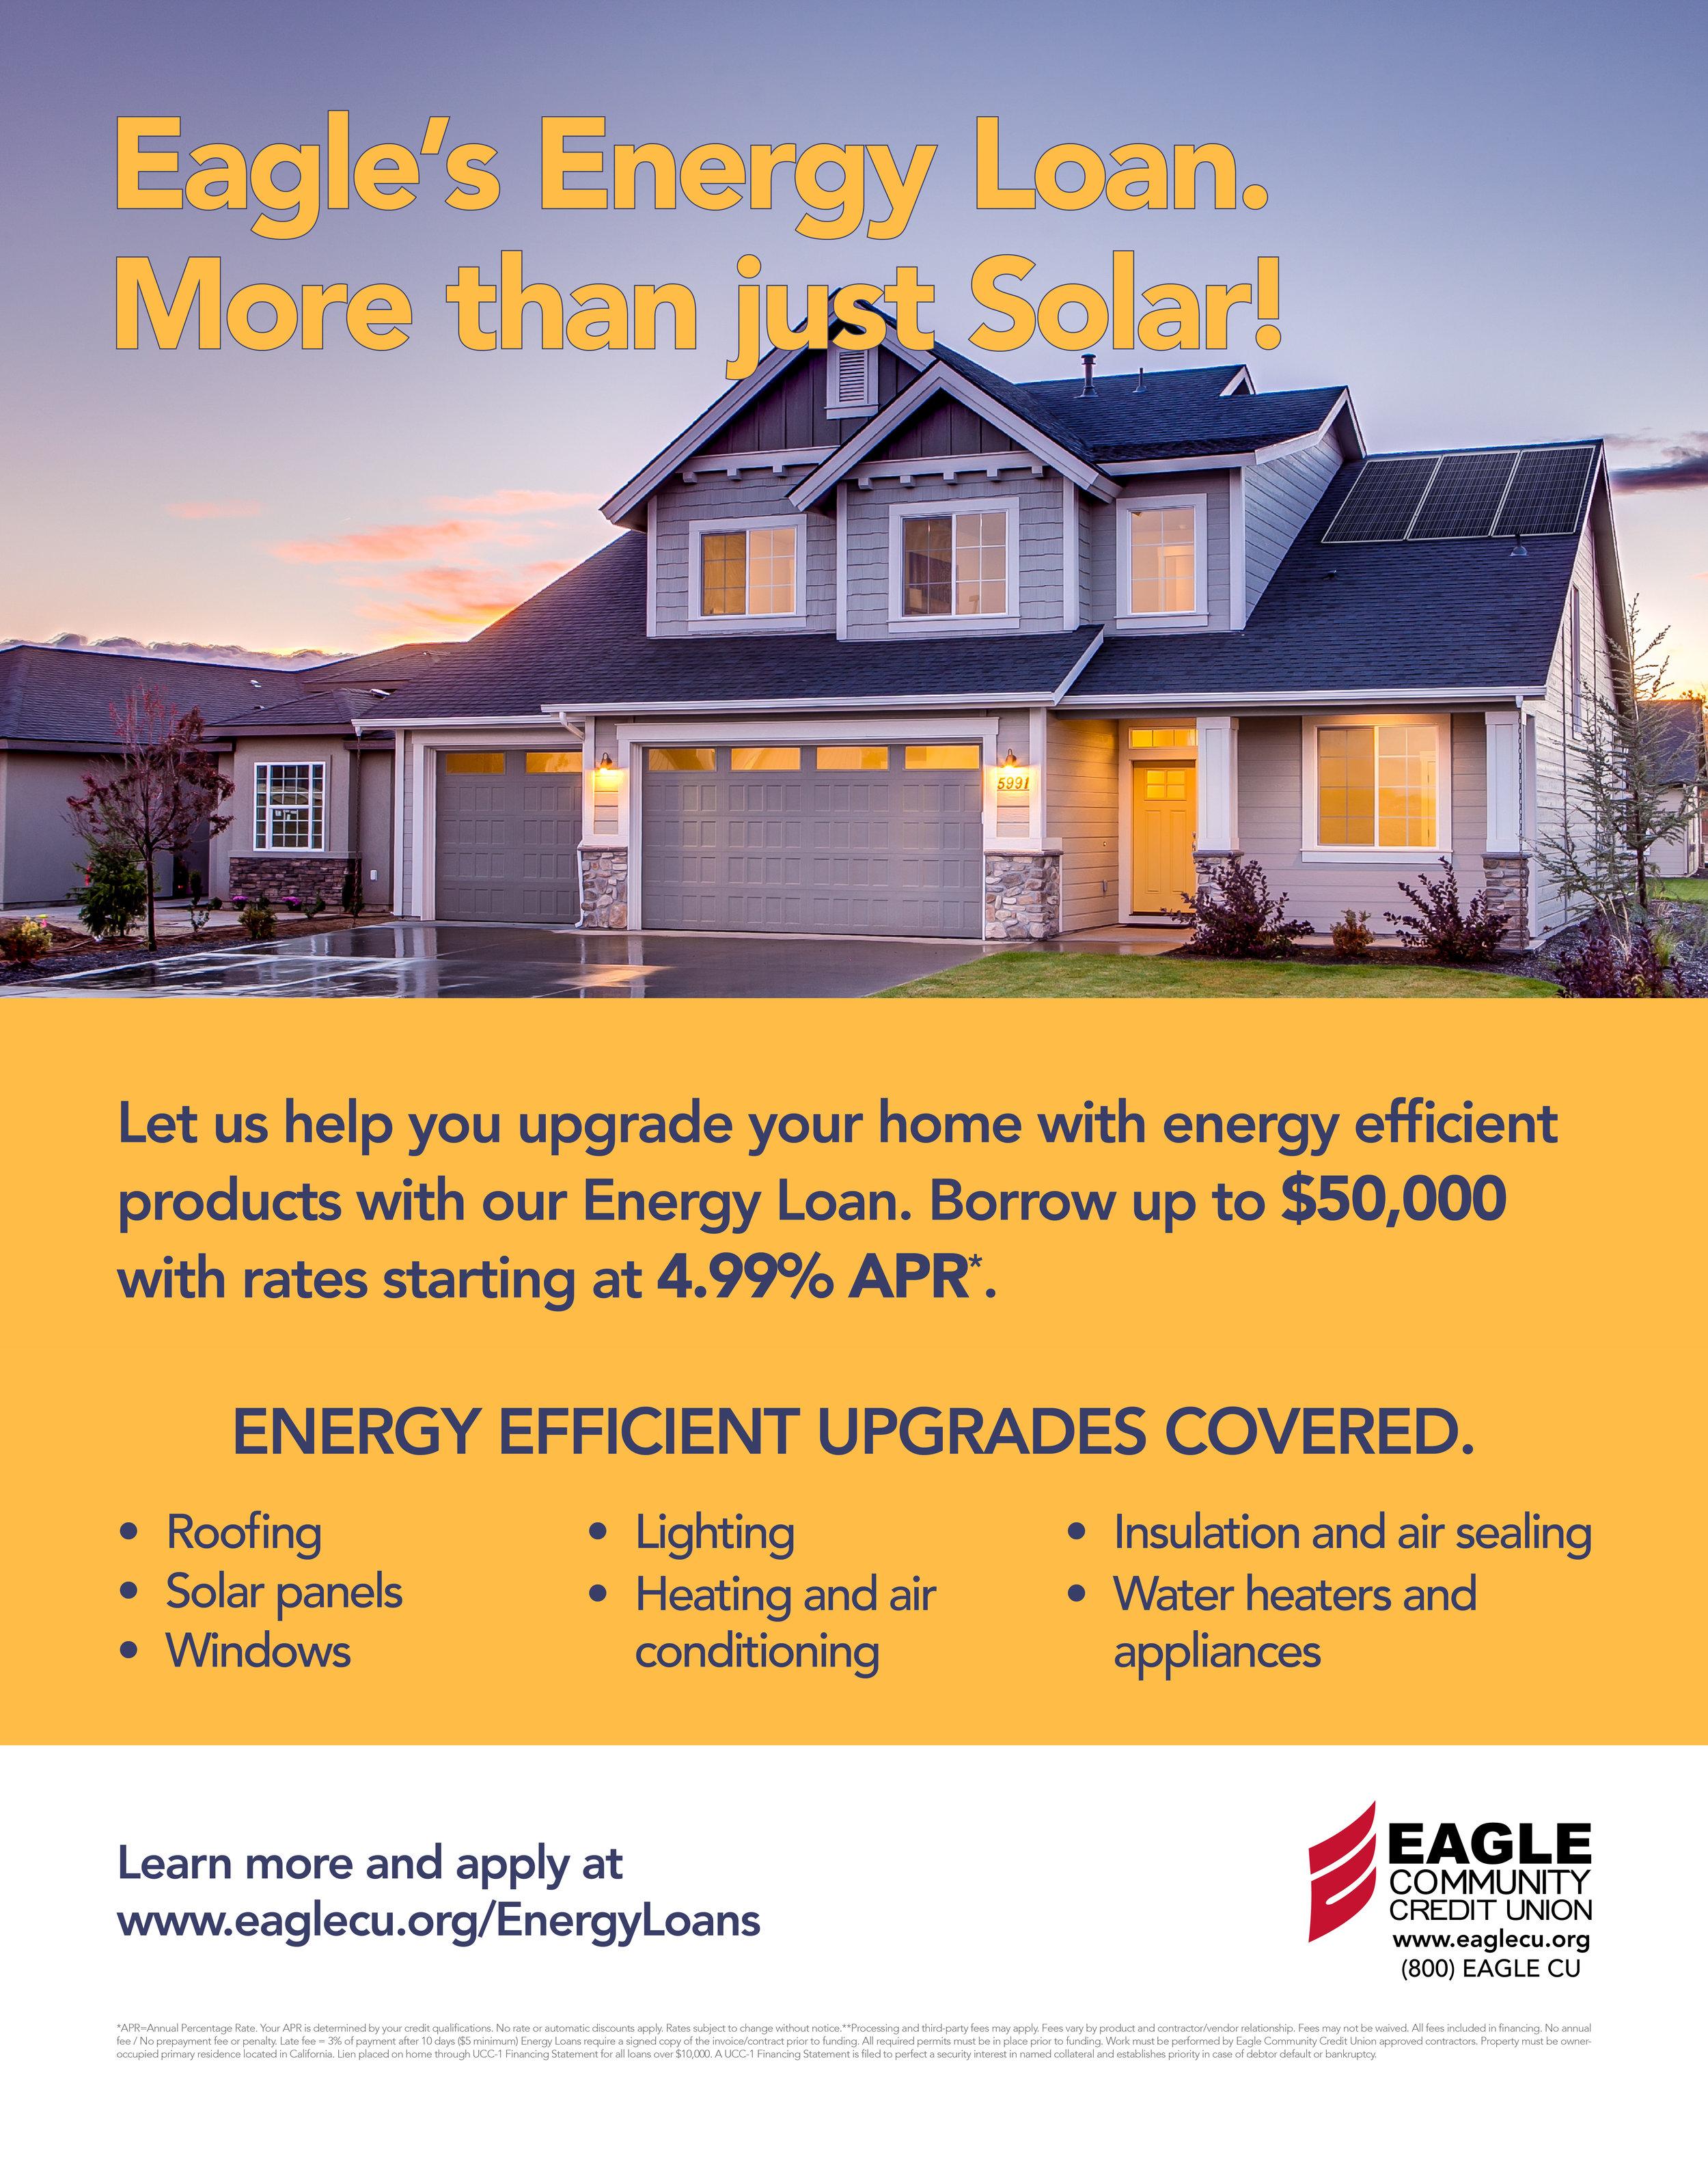 Energy Loan 2017 Poster 22x28.jpg